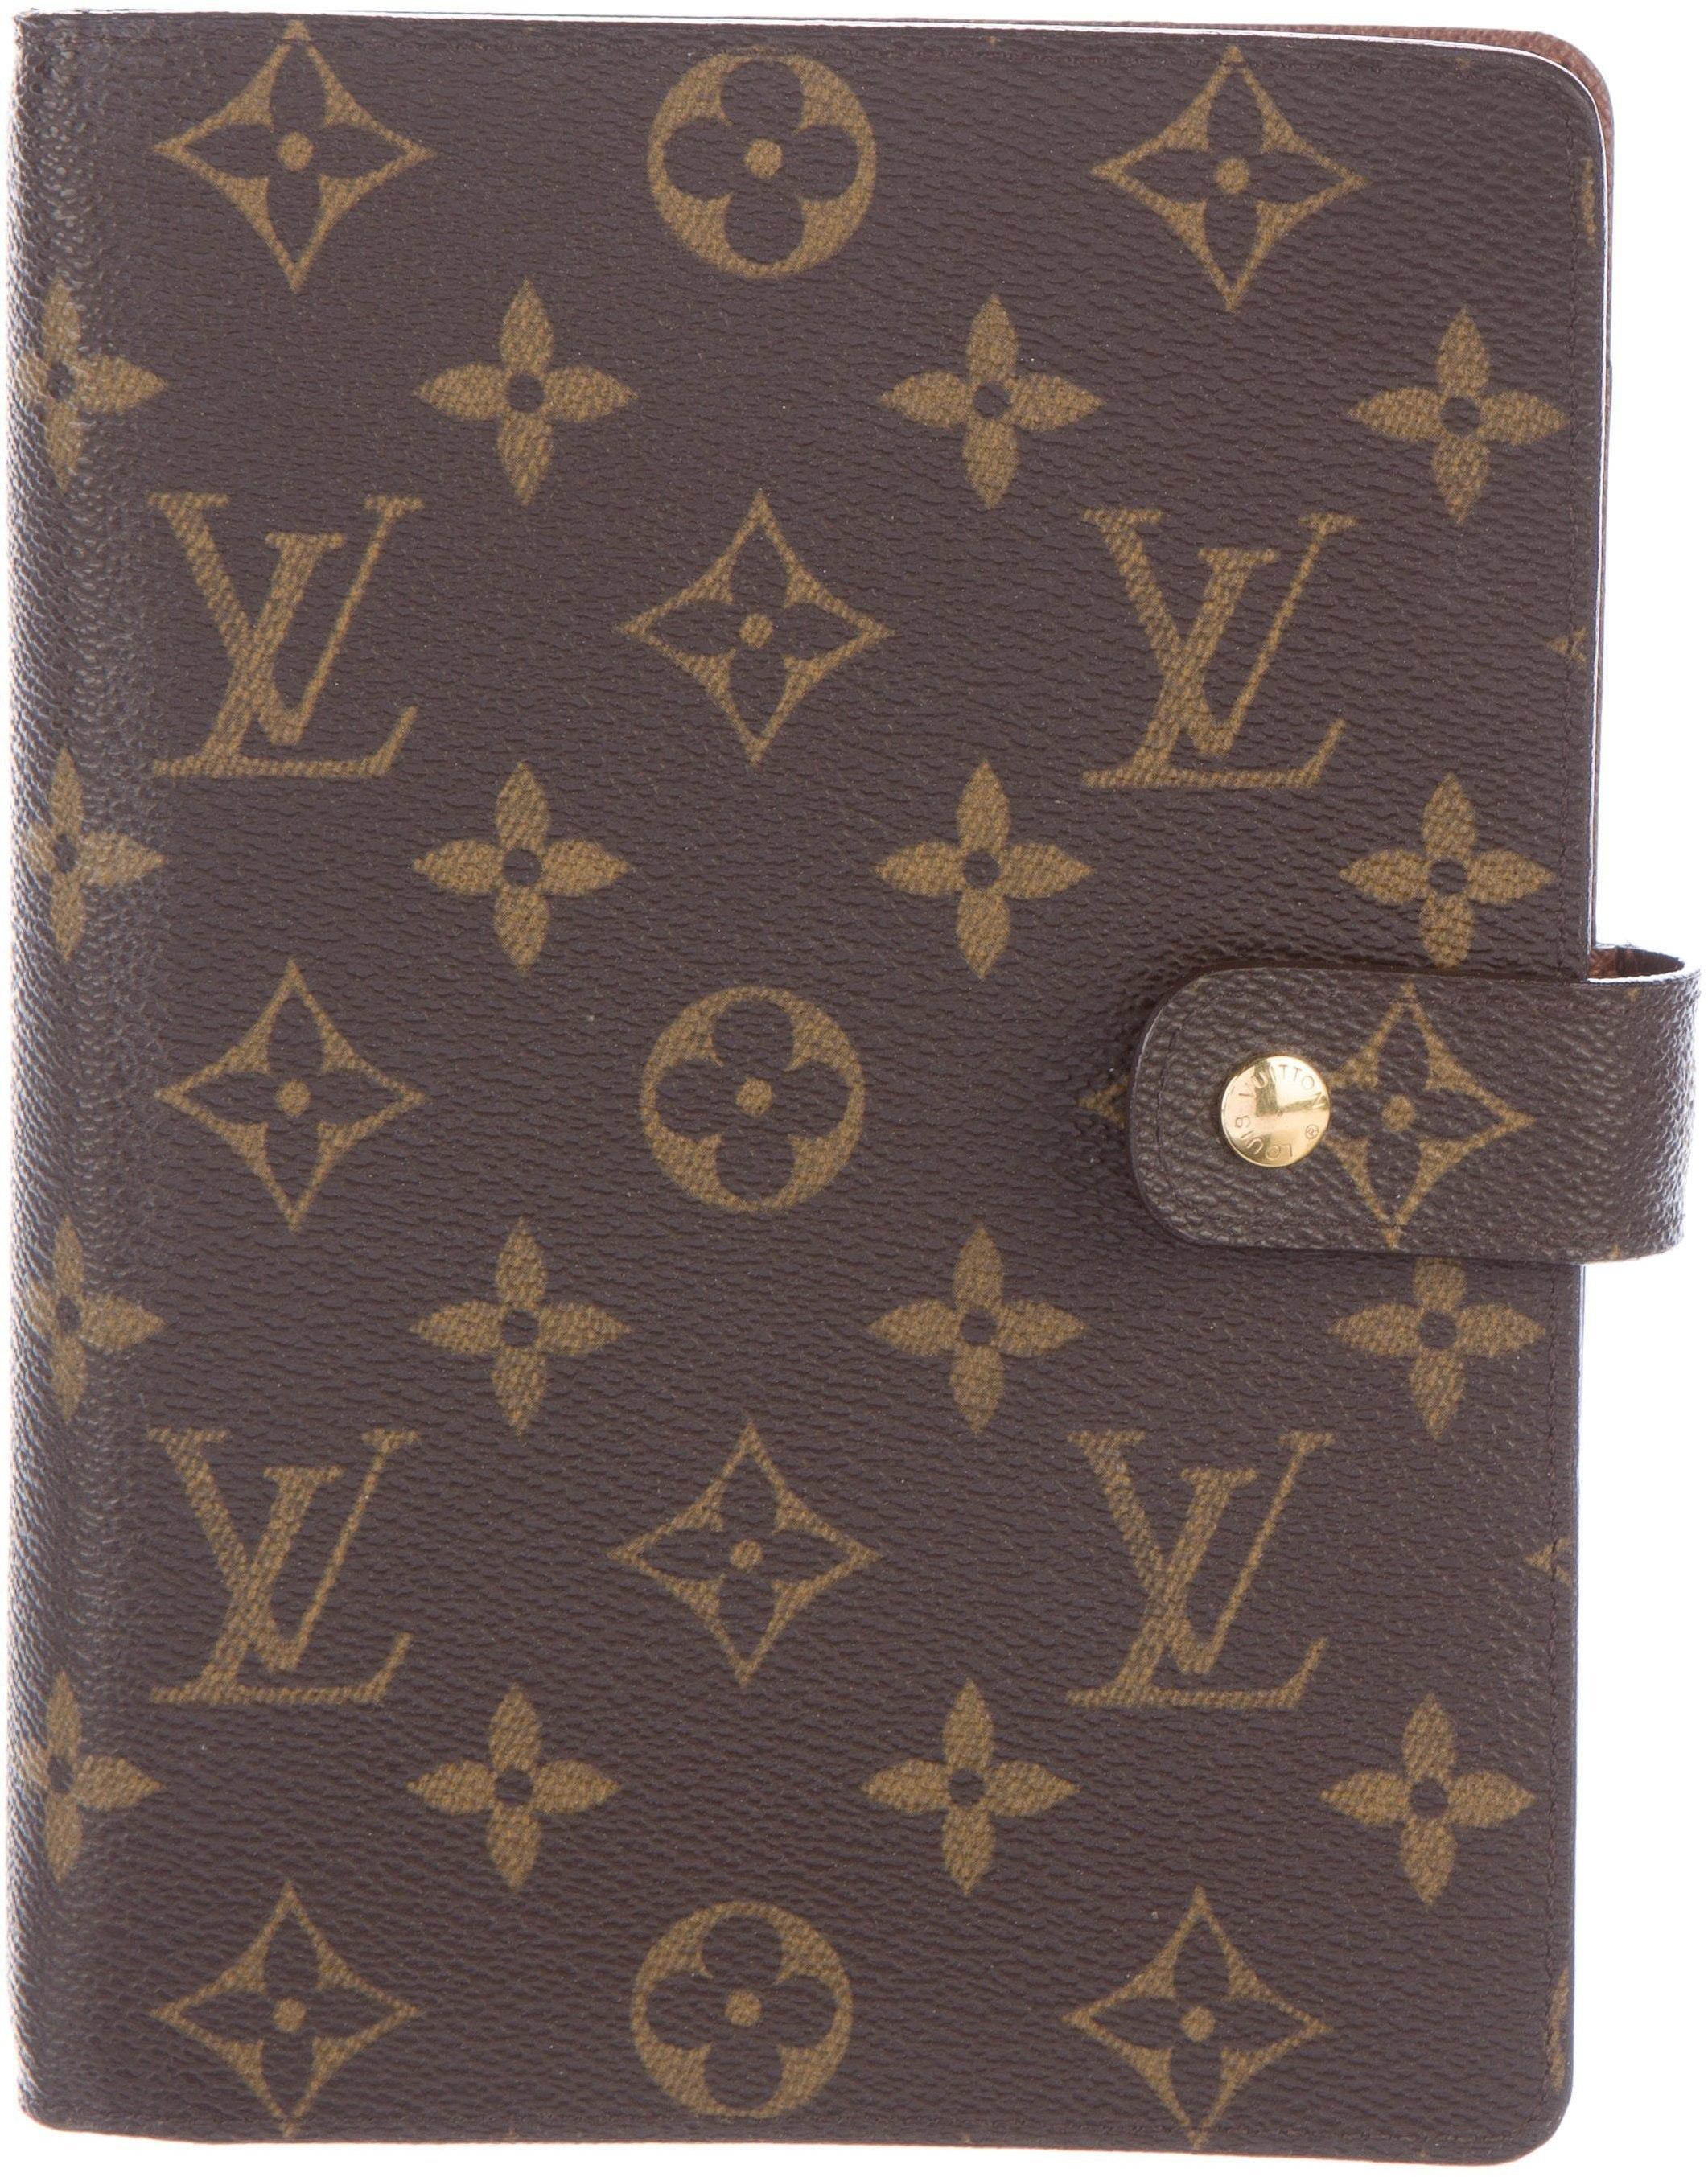 Louis Vuitton Ring Agenda Monogram Medium Brown